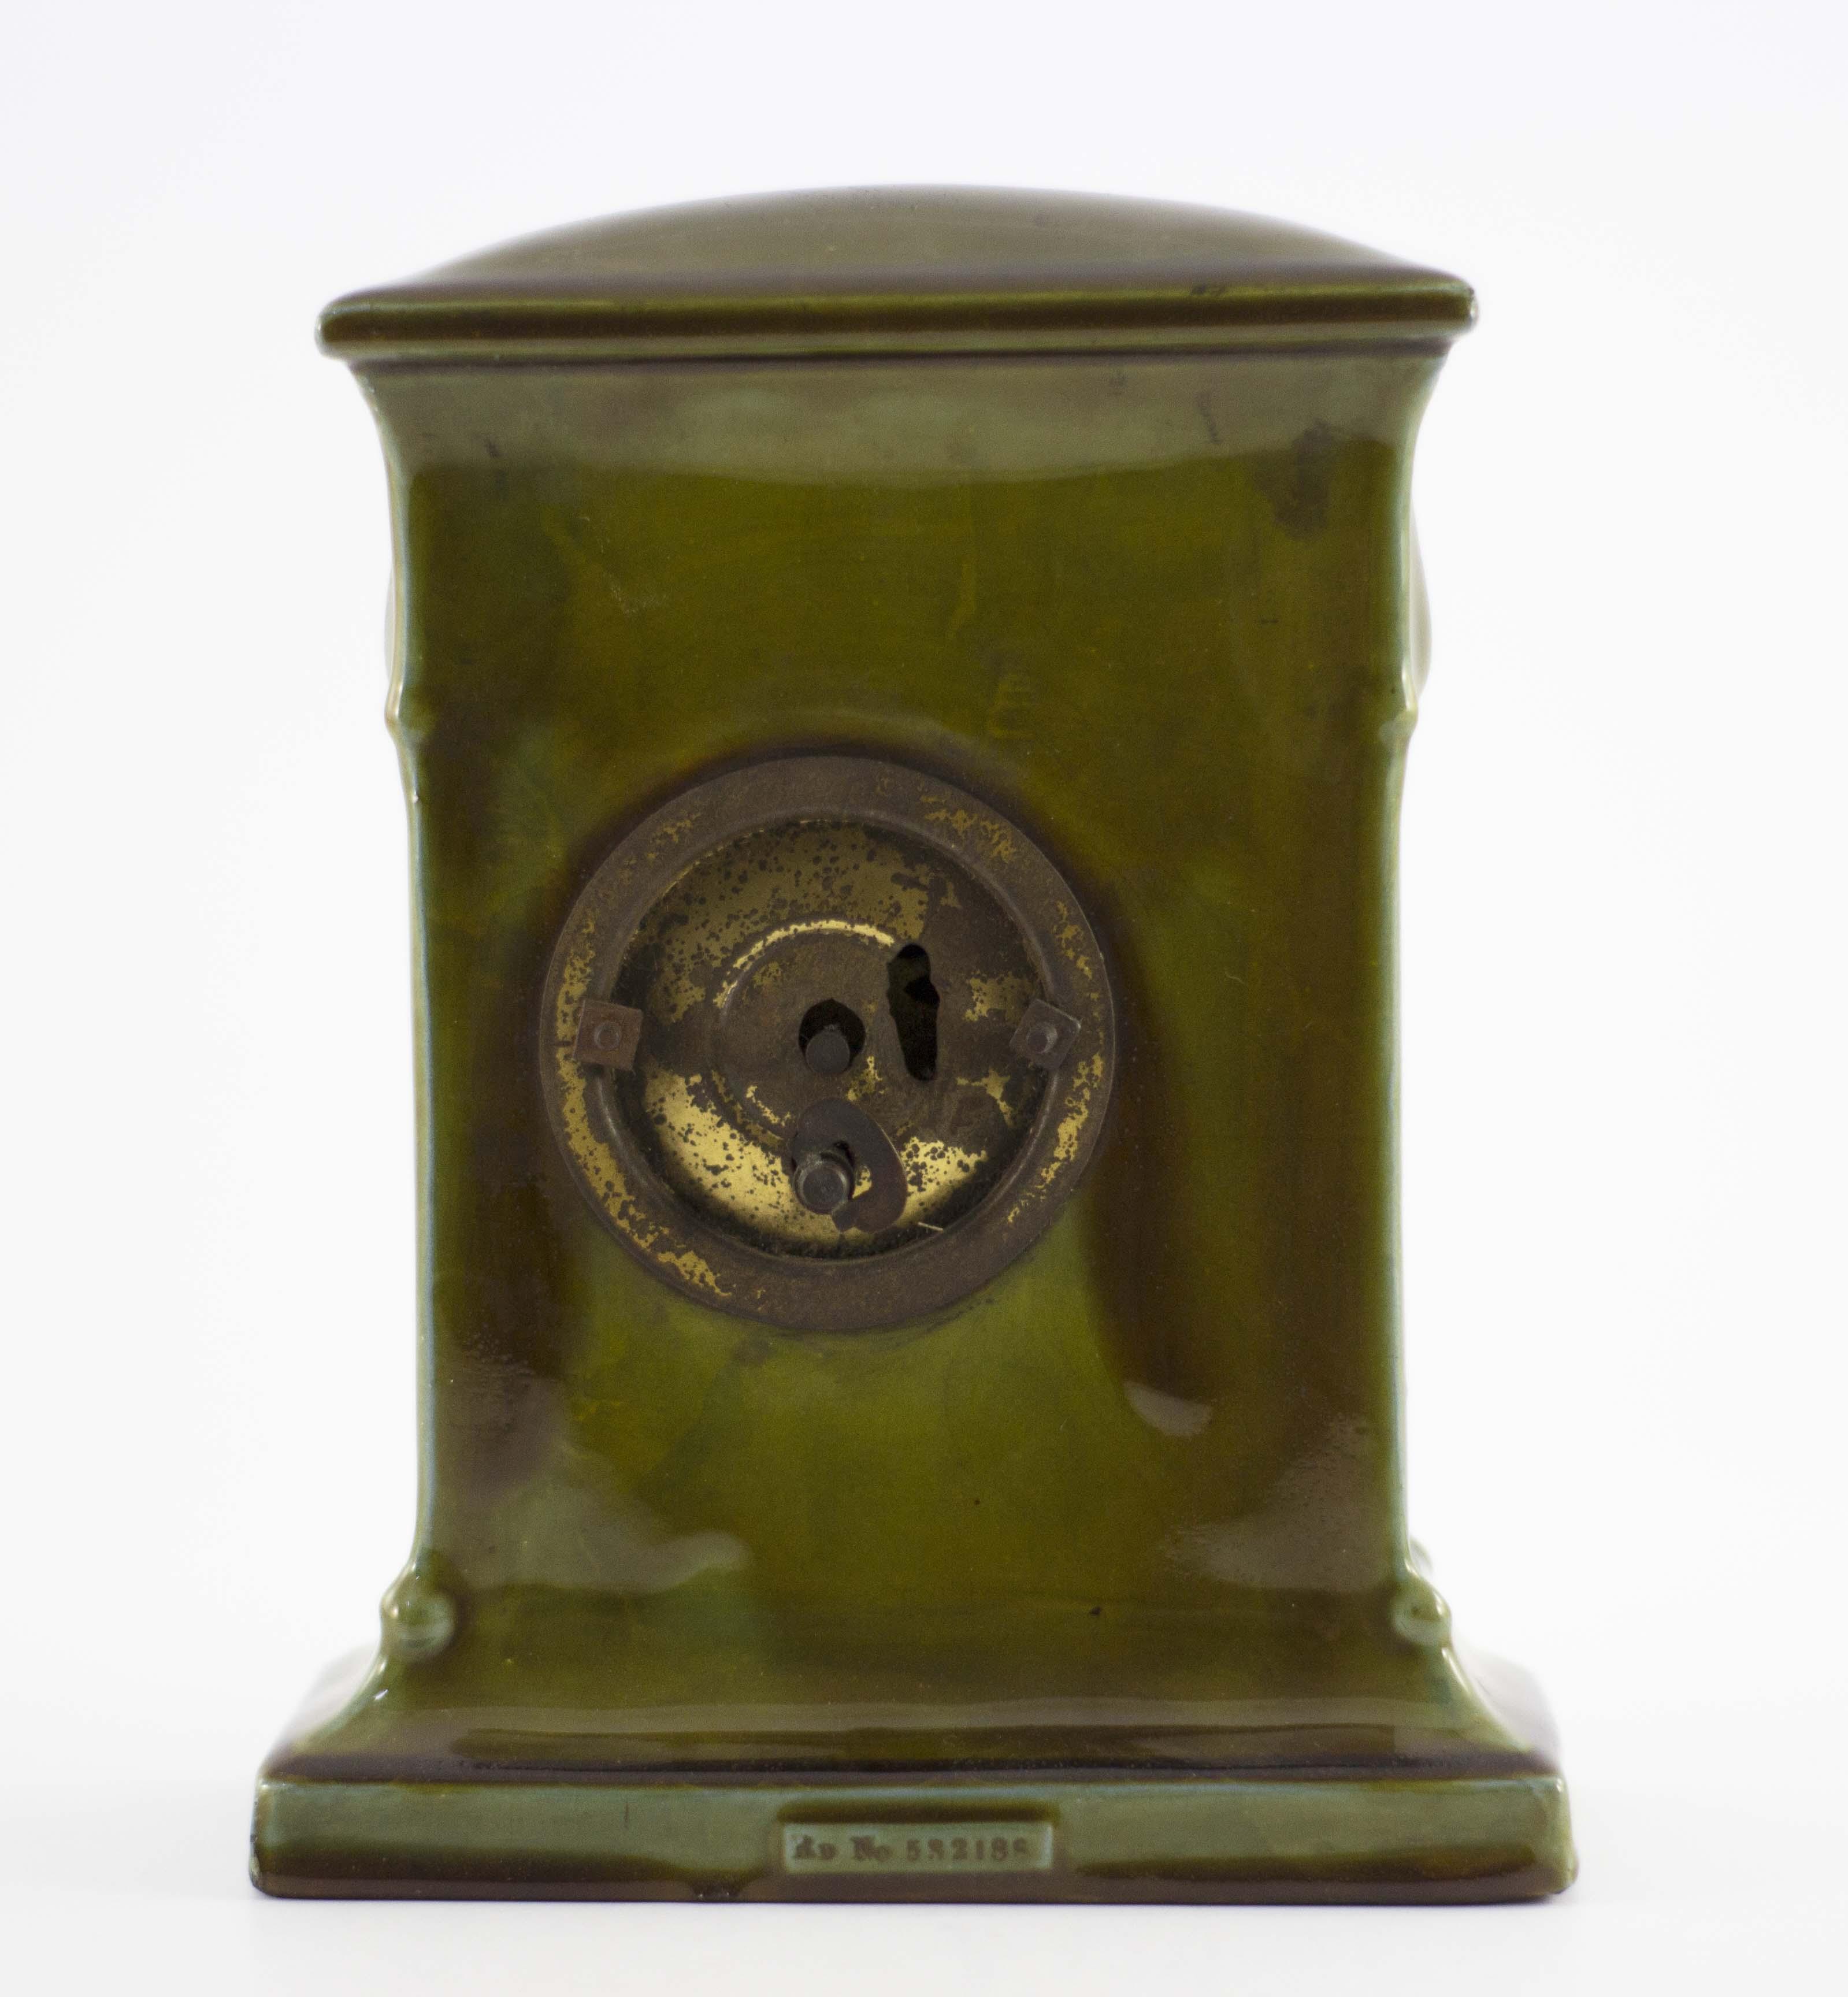 Charles Noke for Royal Doulton, a green Kingsware - Image 4 of 7